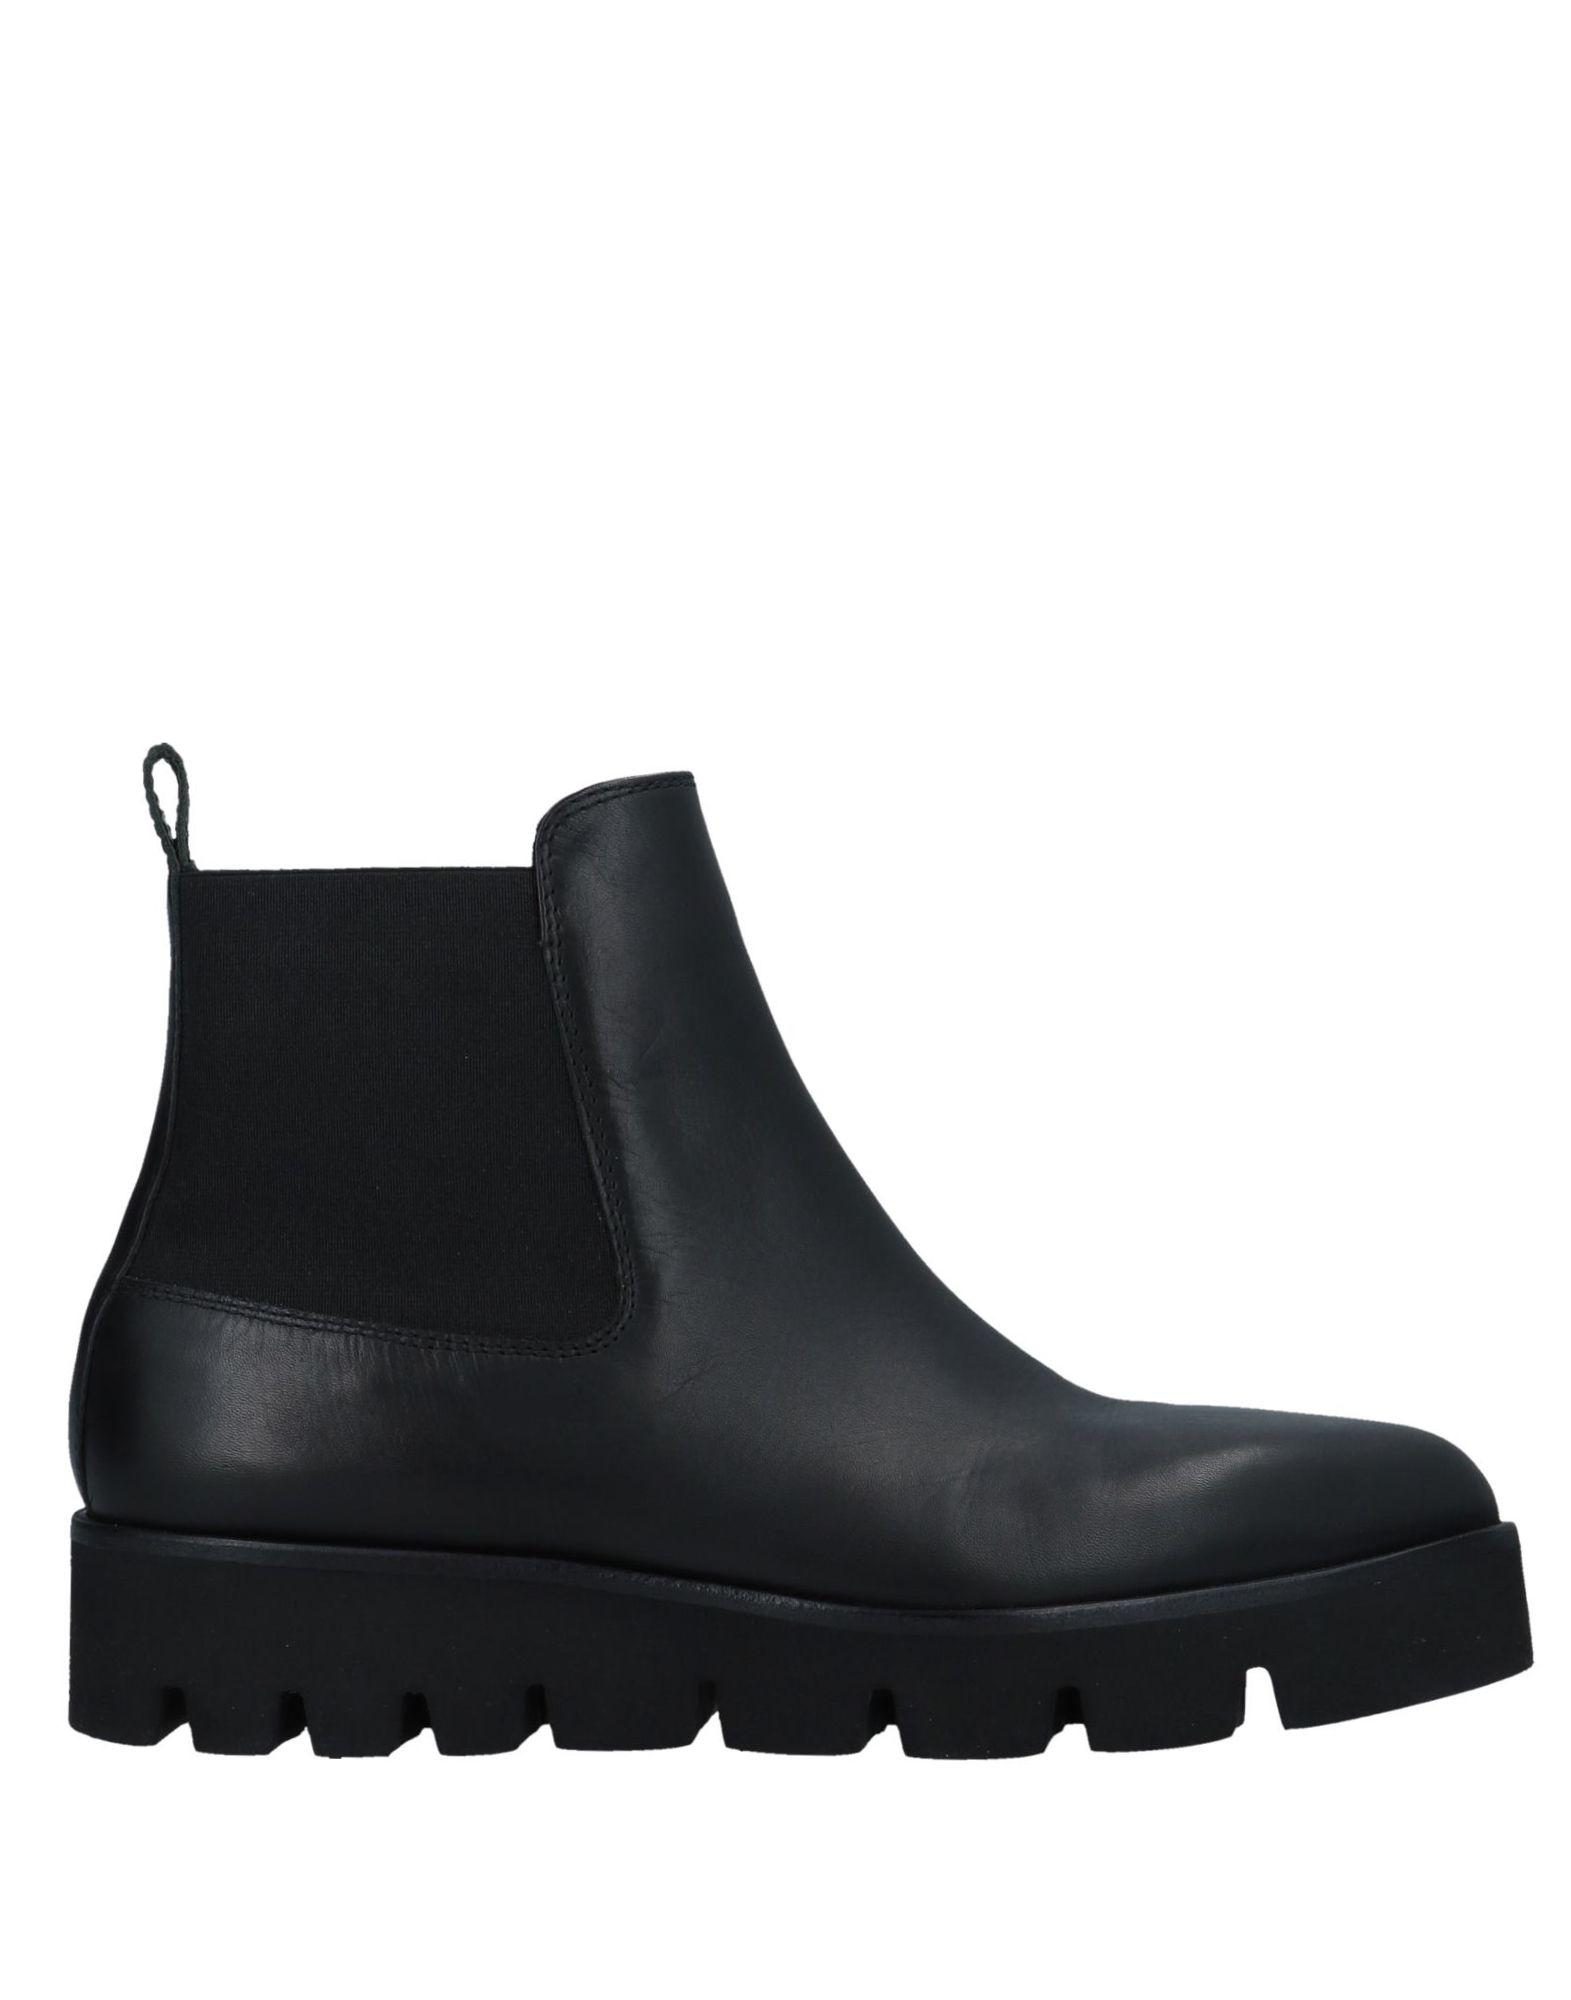 Bottine Akua Femme - Bottines Akua Noir Chaussures femme pas cher homme et femme